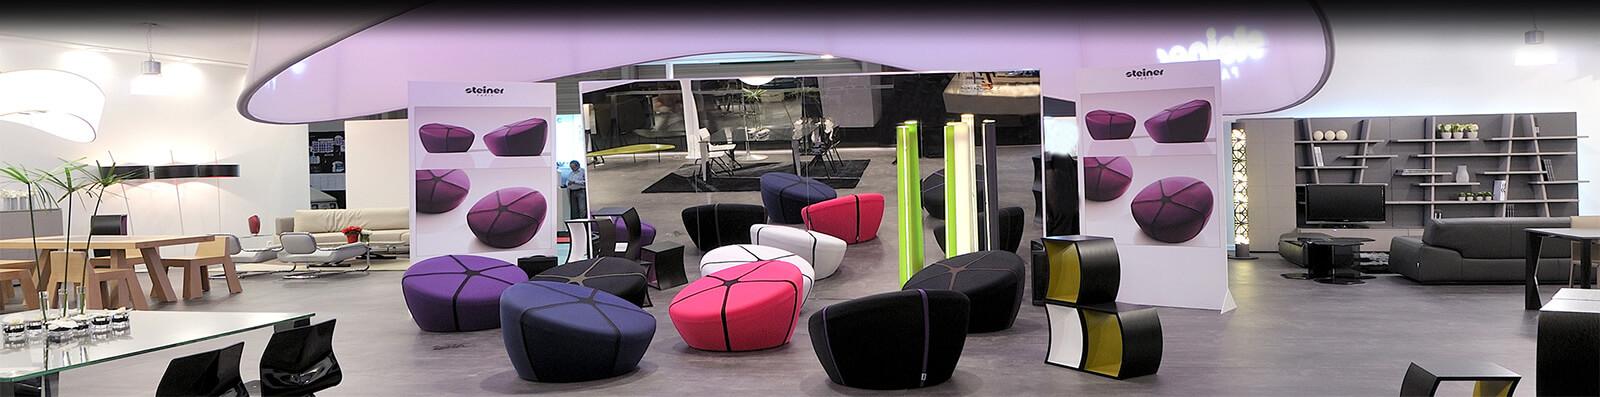 Athenee conception stand salon professionnel v3 ath n e for Stand salon professionnel